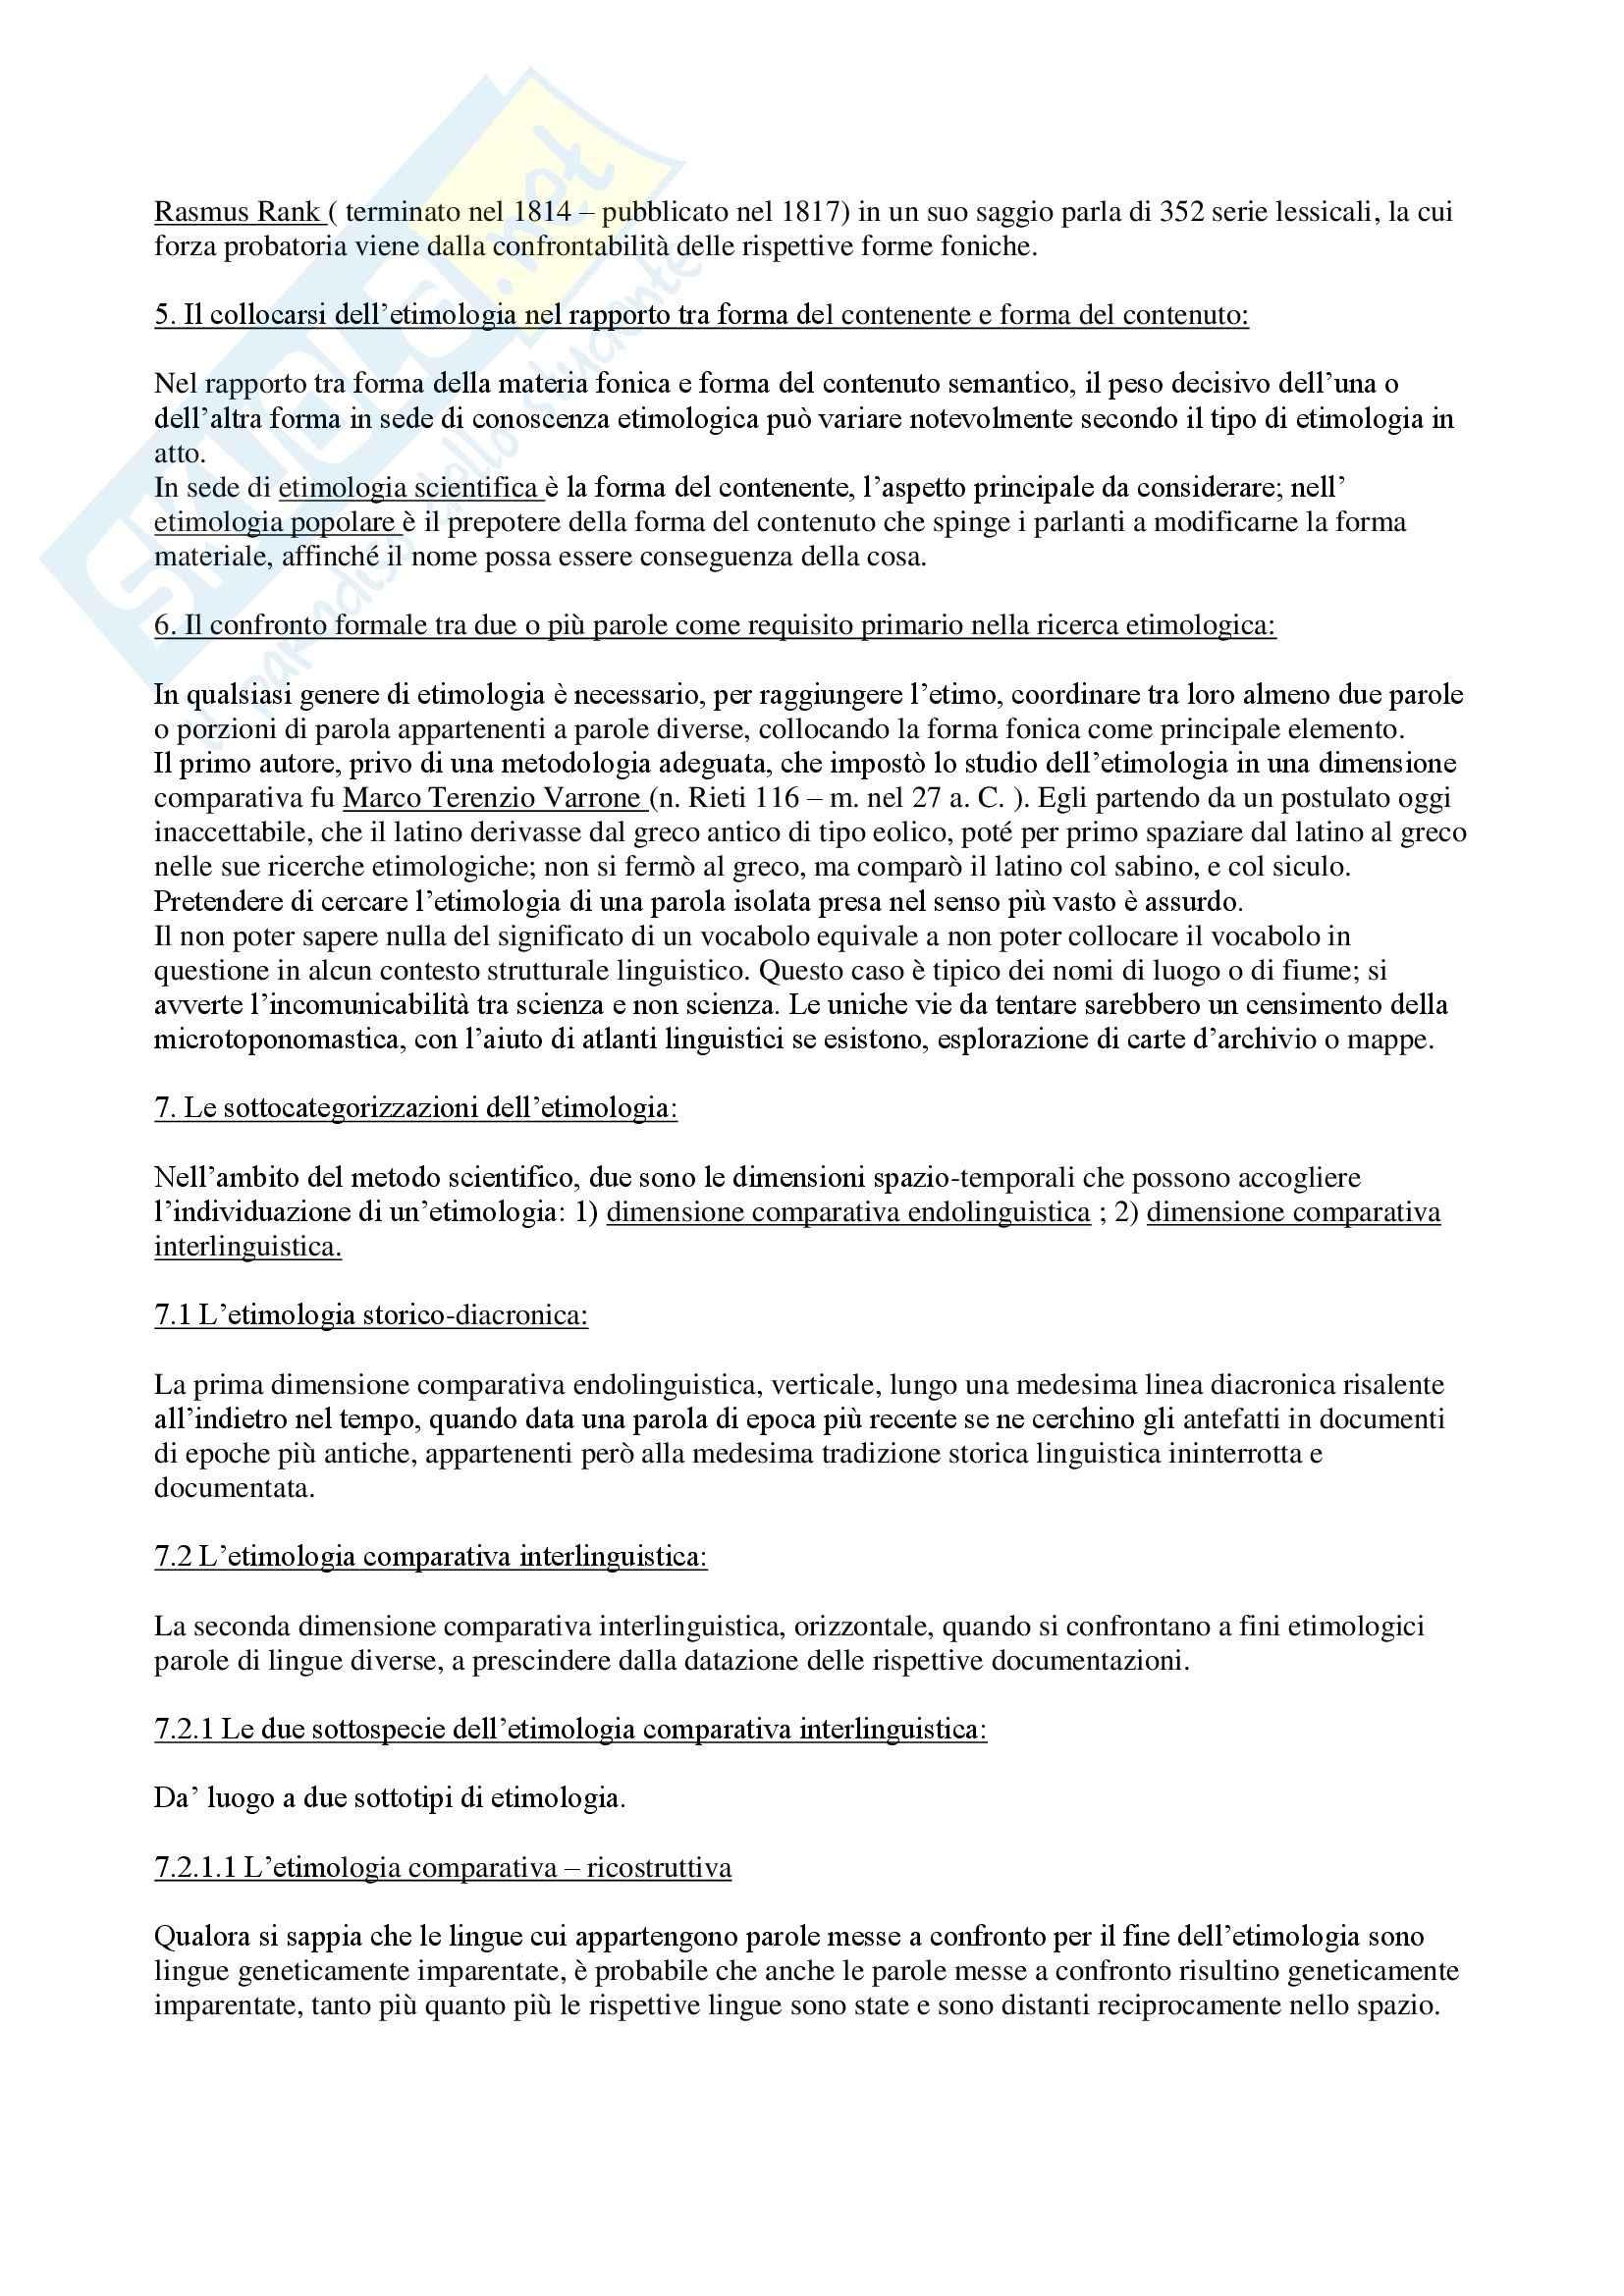 Etimologia - Appunti Pag. 2